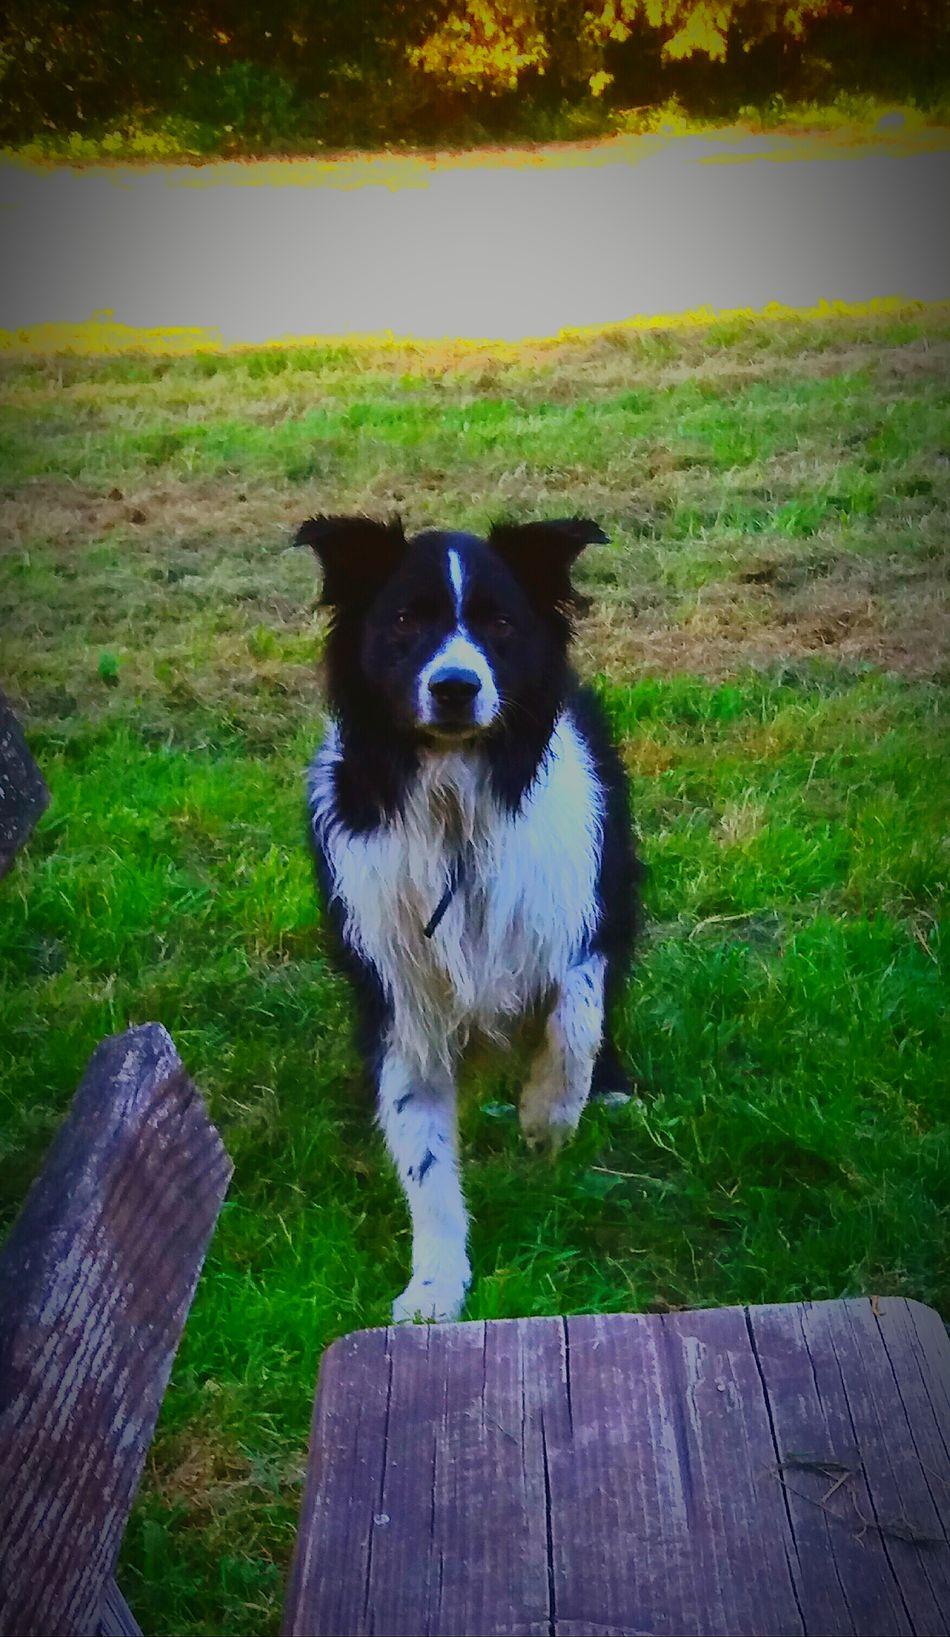 First Eyeem Photo Blackandwhite Border Collie Australienshepard Dog Pets Animal Animal Themes Black Color Waiting Playing